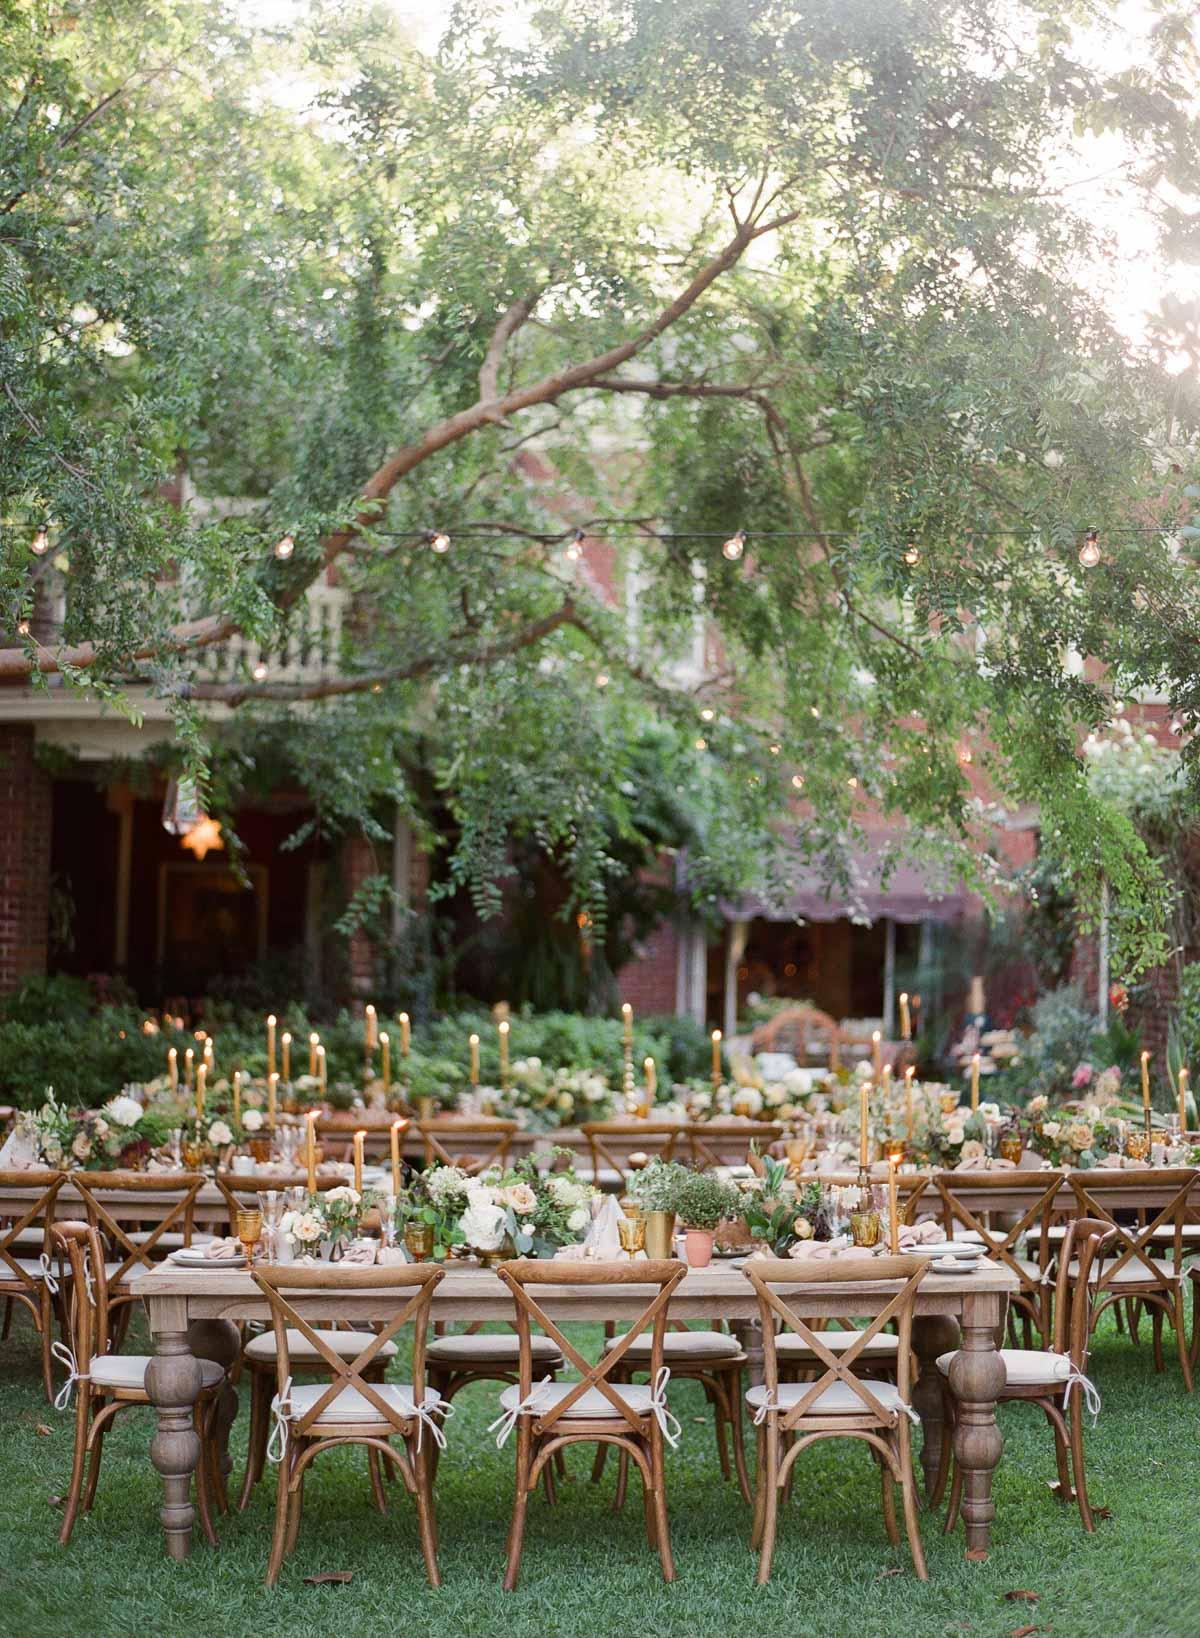 Lauren_Travis_Backyard_California_Wedding (c) Greg_Finck-110.jpg